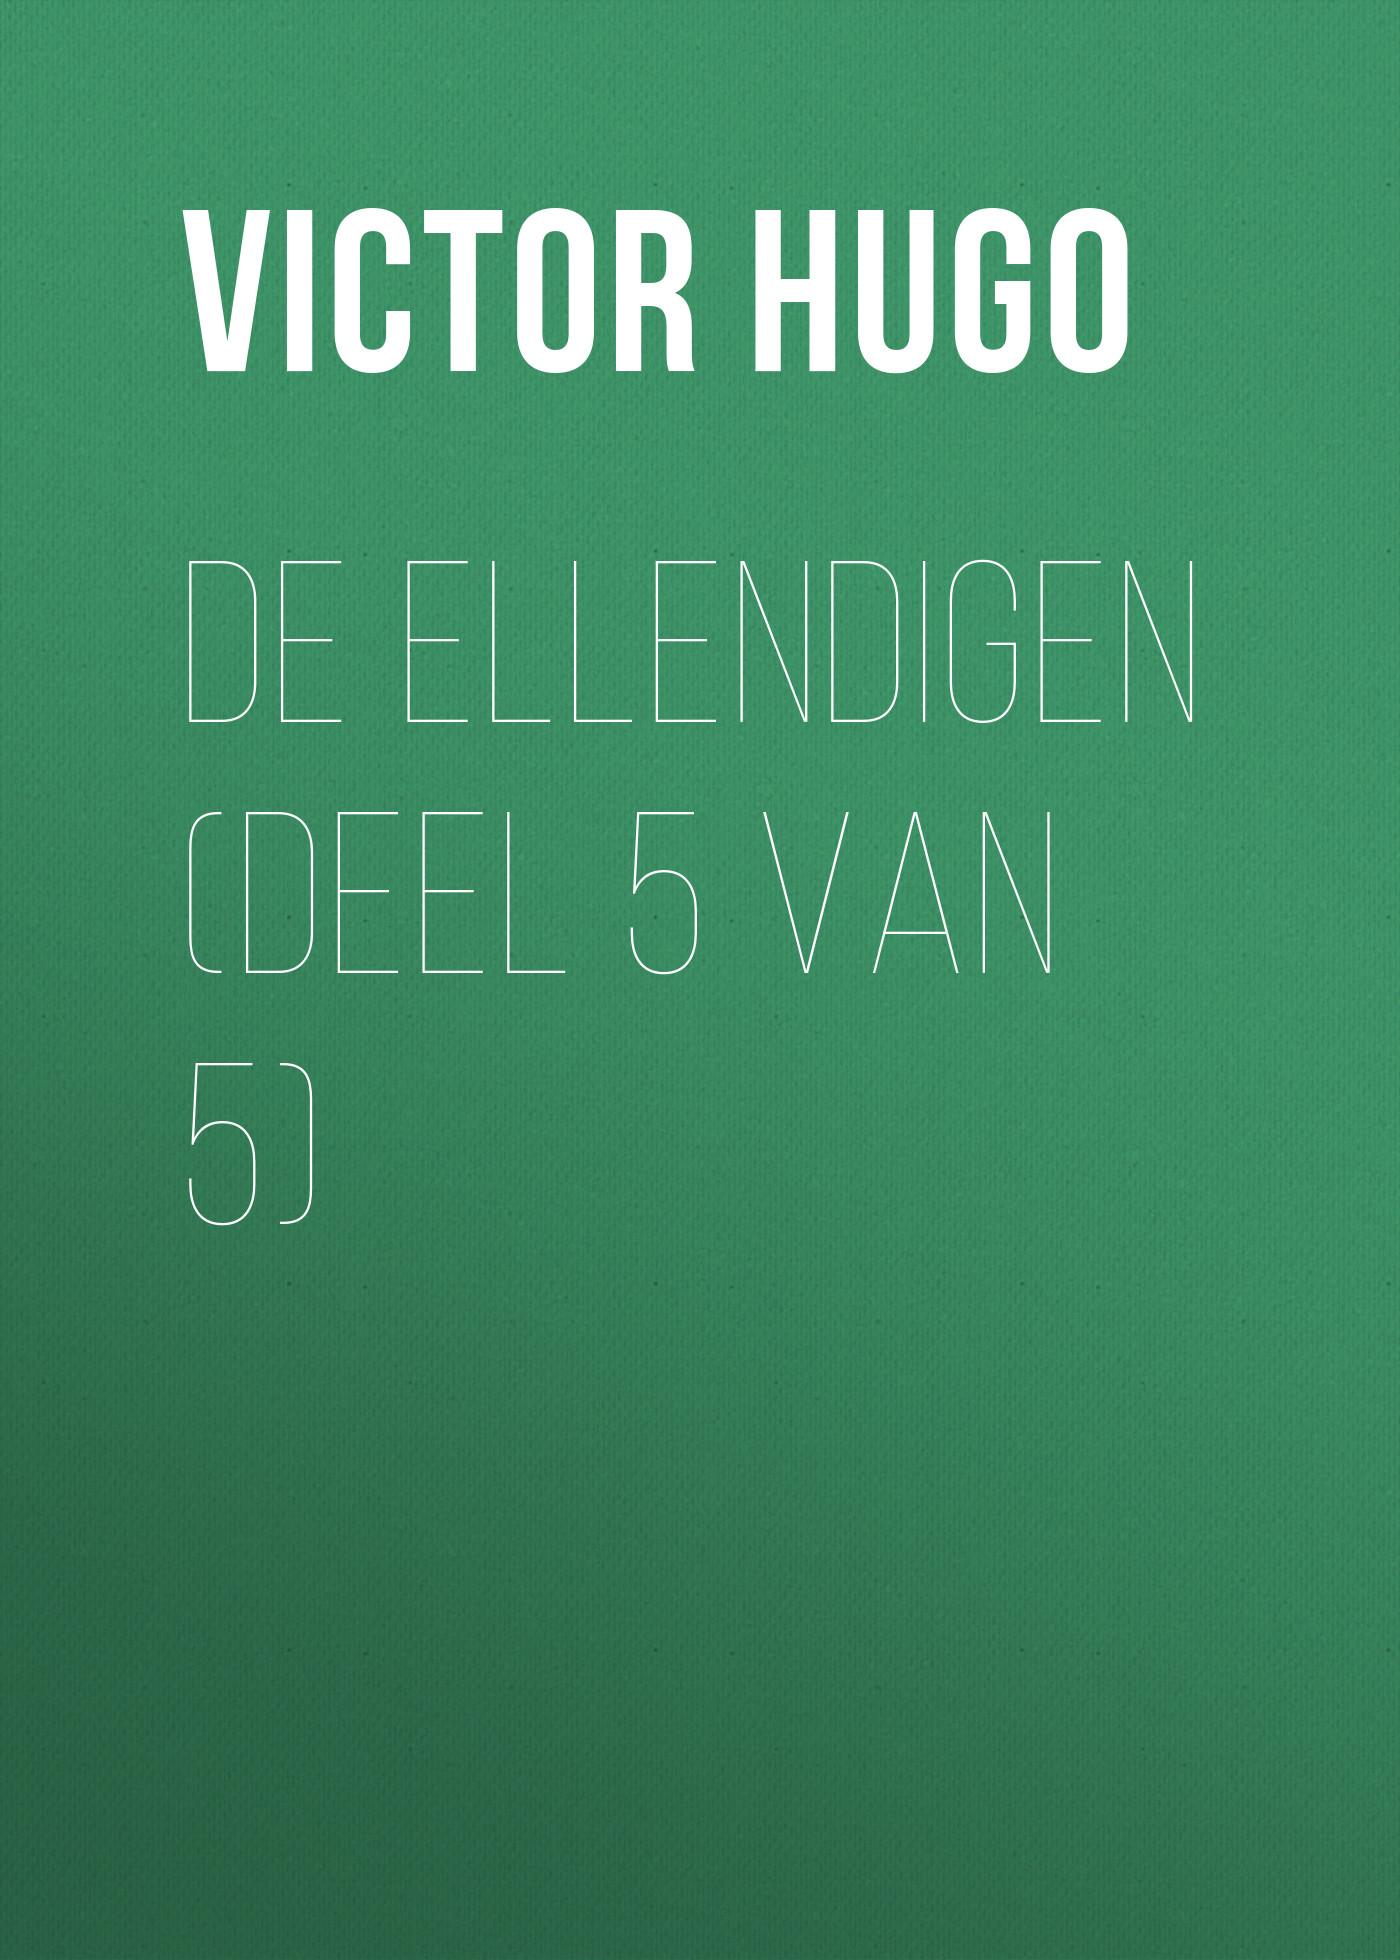 Виктор Мари Гюго De Ellendigen (Deel 5 van 5) цена